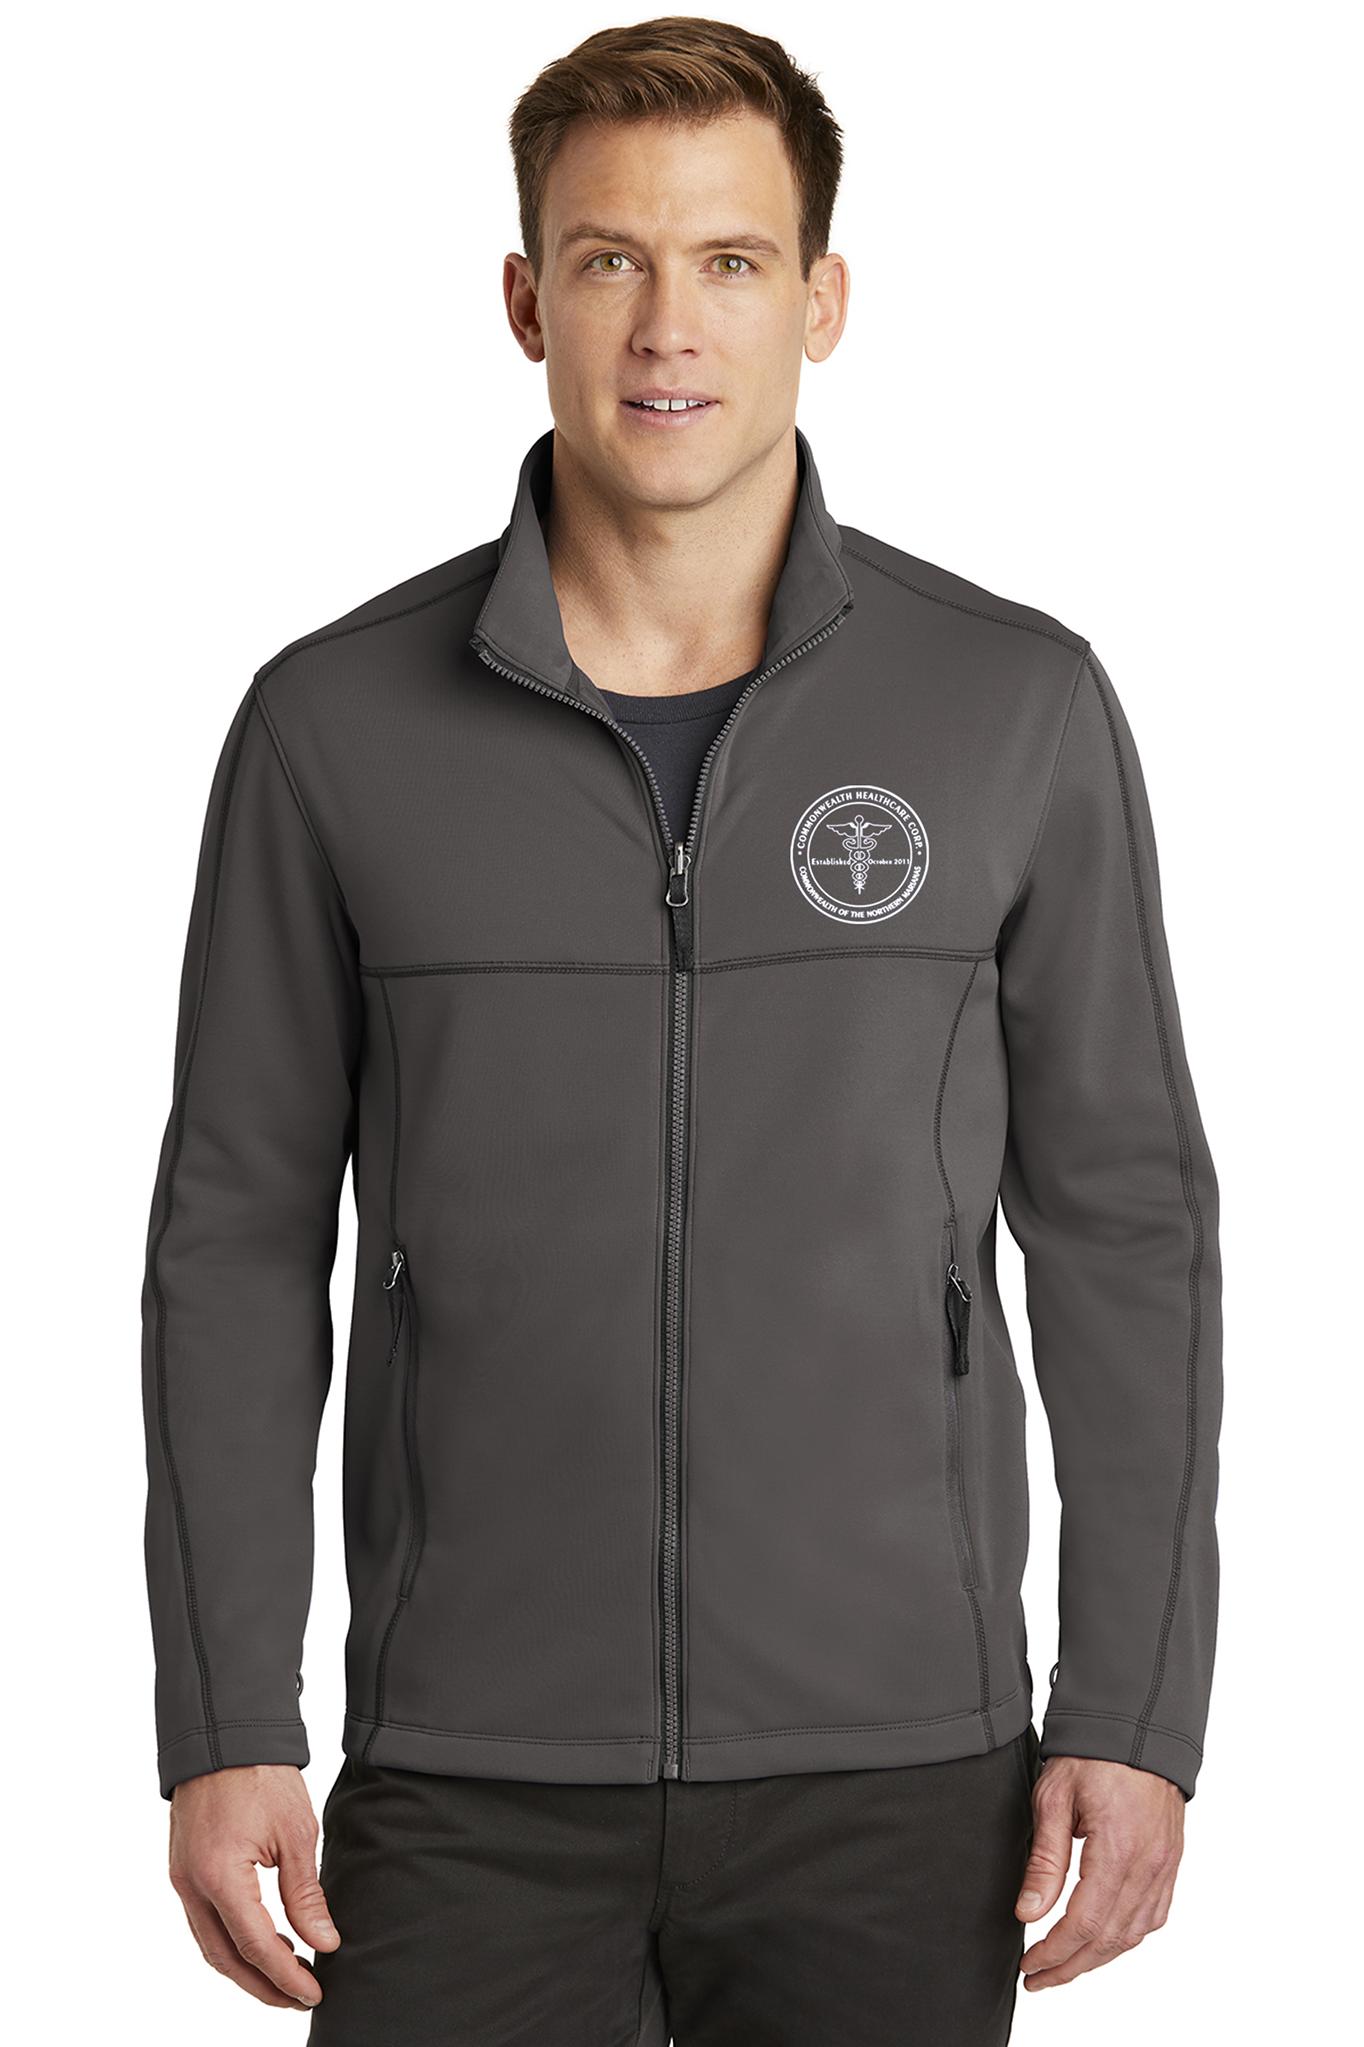 Port Authority F904 - Men's Collective Smooth Fleece Jacket